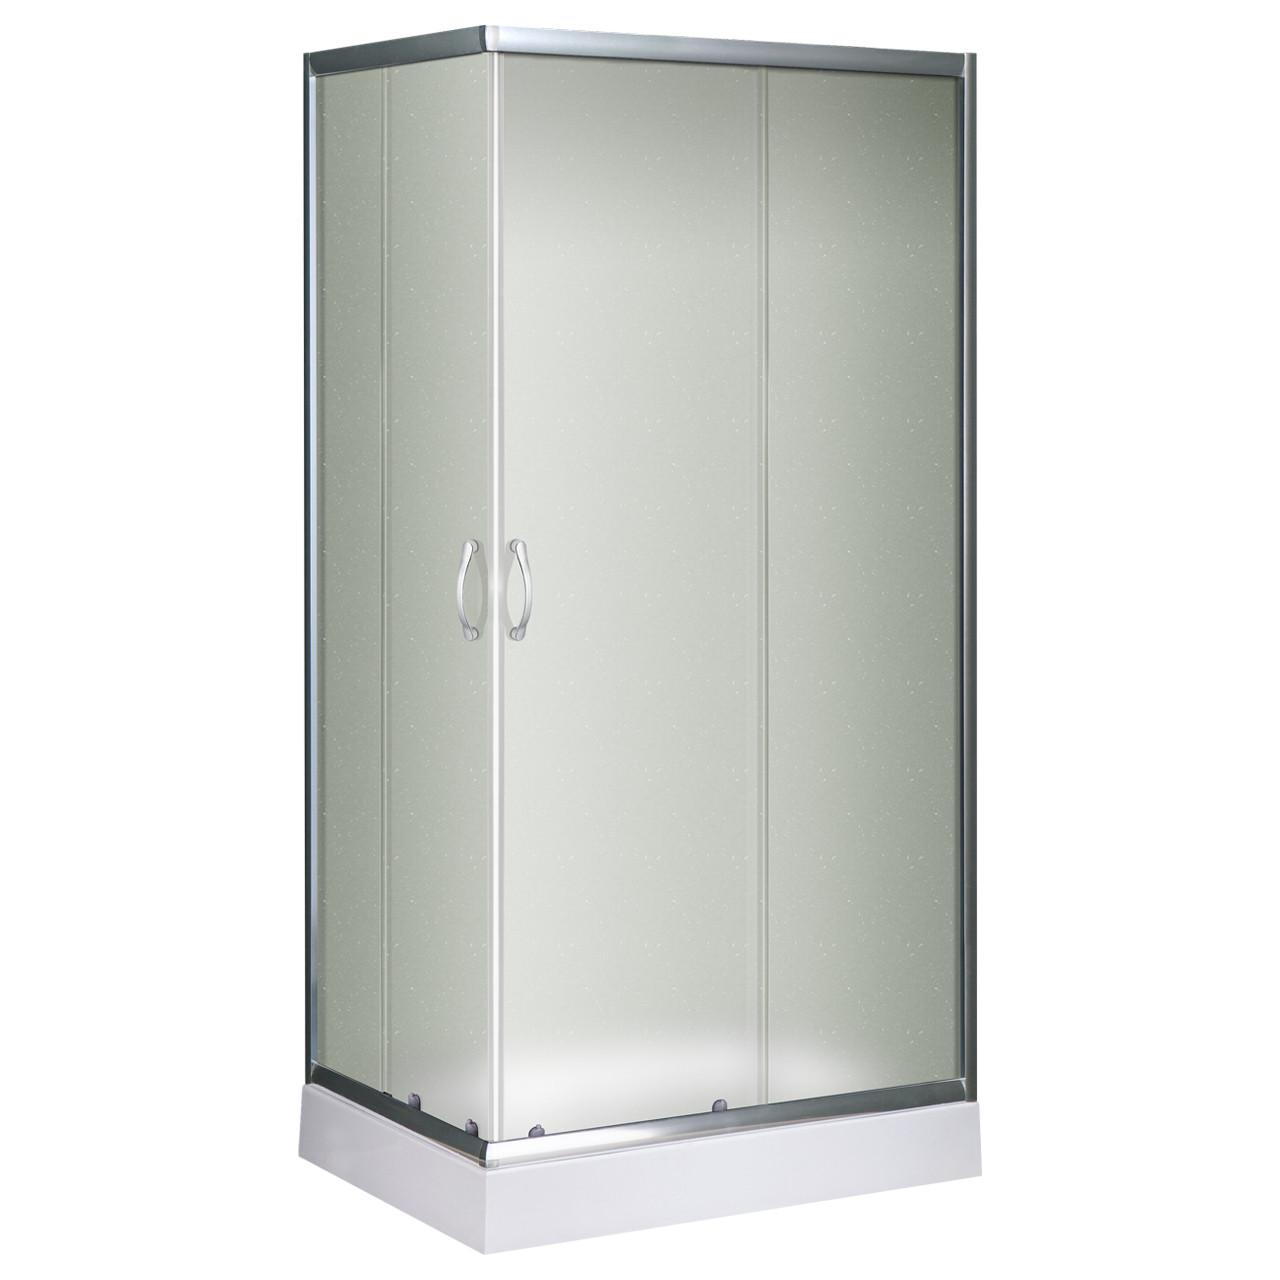 D90-70/15 R, душевая кабина Sansa, 90 х 70 см, рама сатин, стекло матовое